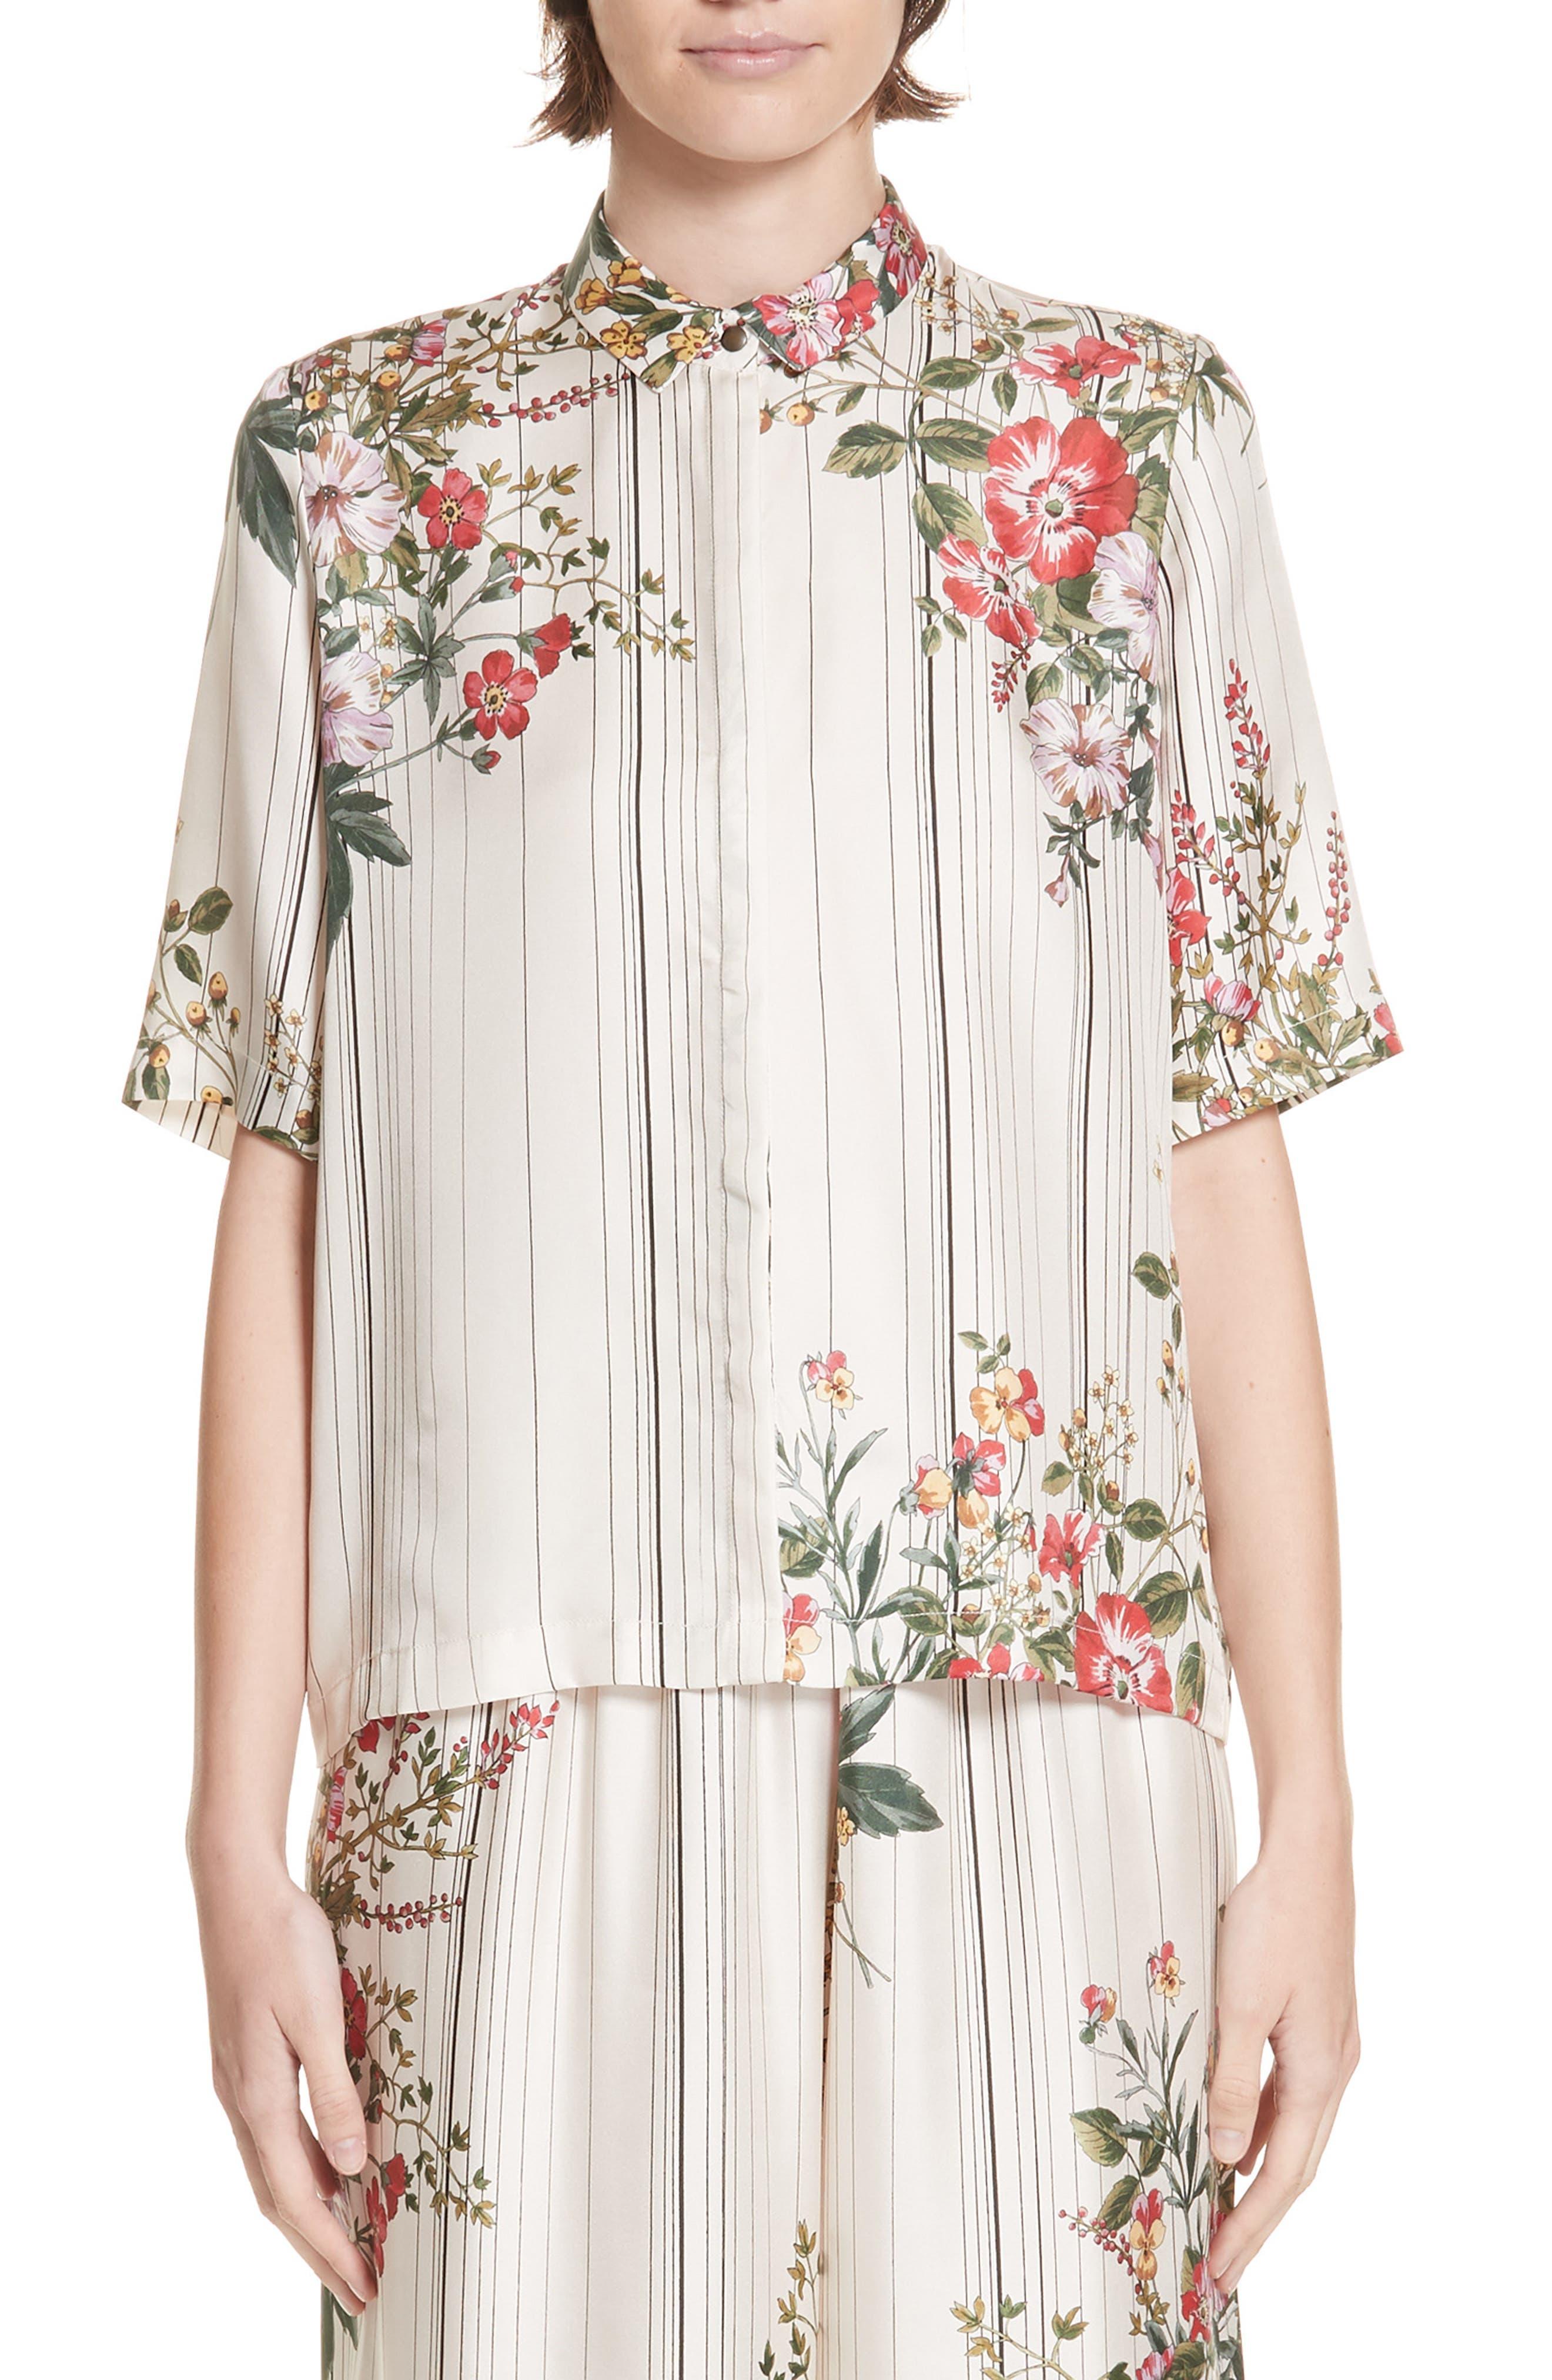 ROSEANNA Kinney Floral & Stripe Silk Shirt in Multi Ivoire